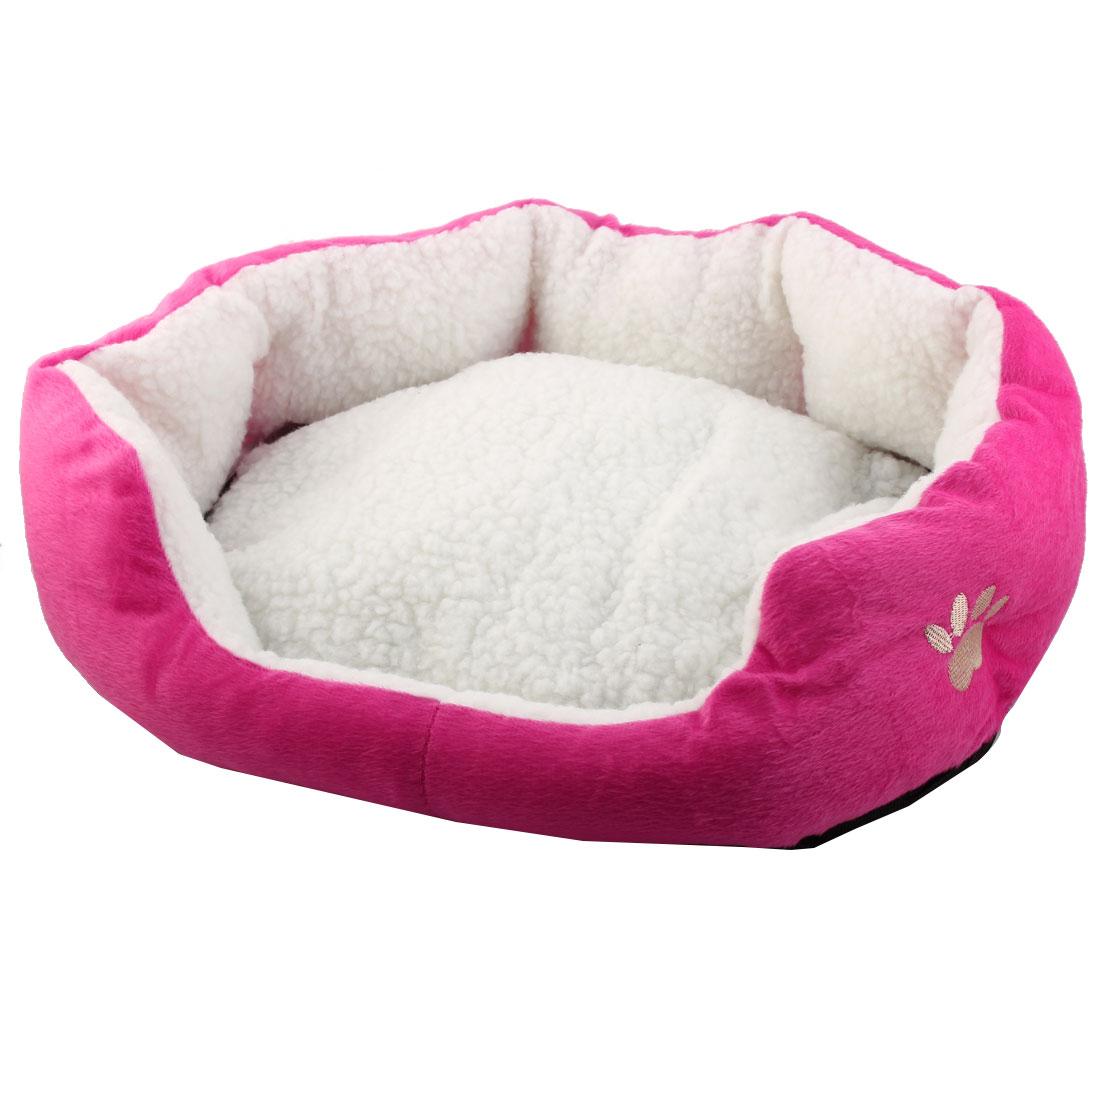 Pet Plush Oval Shape Removable Cushion Nesting Dog Bed Cave Fuchsia 50cm x 40cm